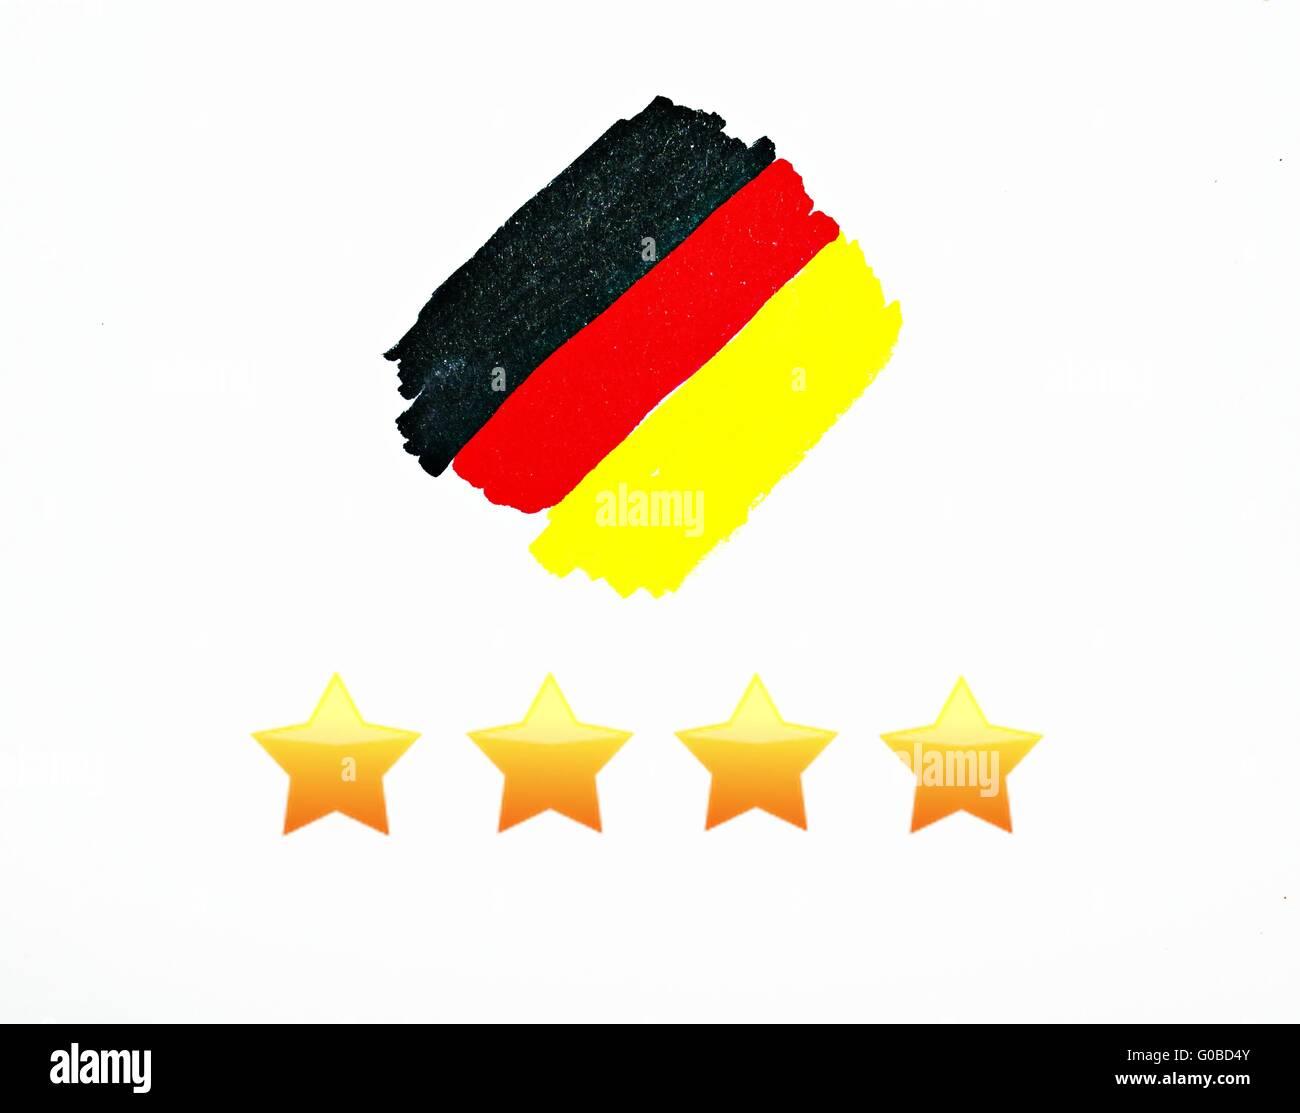 4 times football worldchampion germany - Stock Image